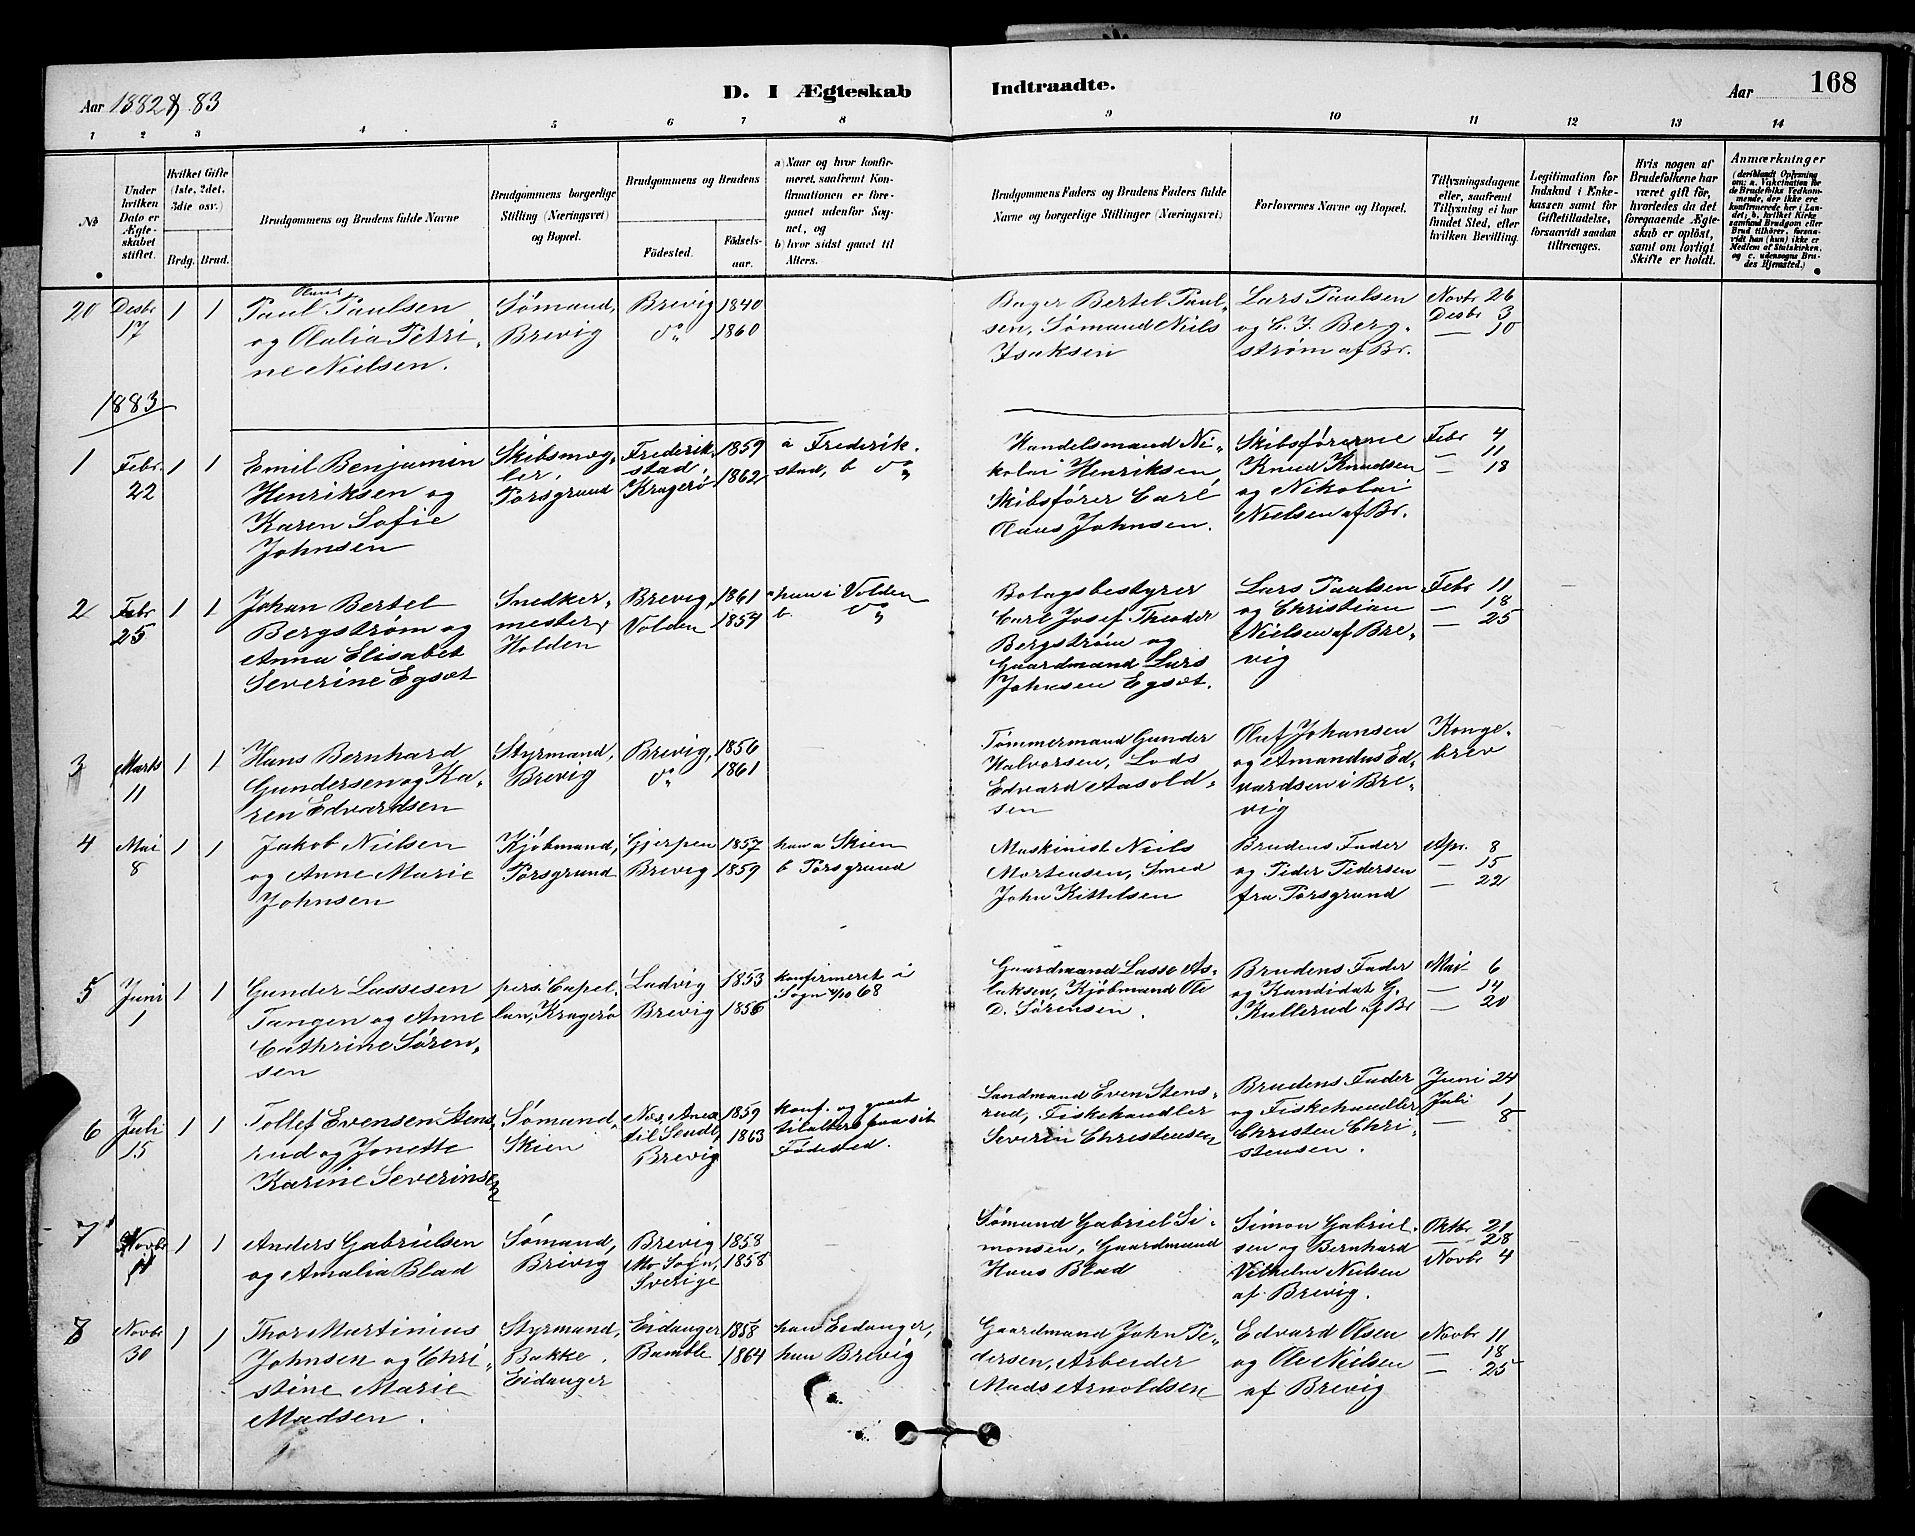 SAKO, Brevik kirkebøker, G/Ga/L0004: Klokkerbok nr. 4, 1882-1900, s. 168